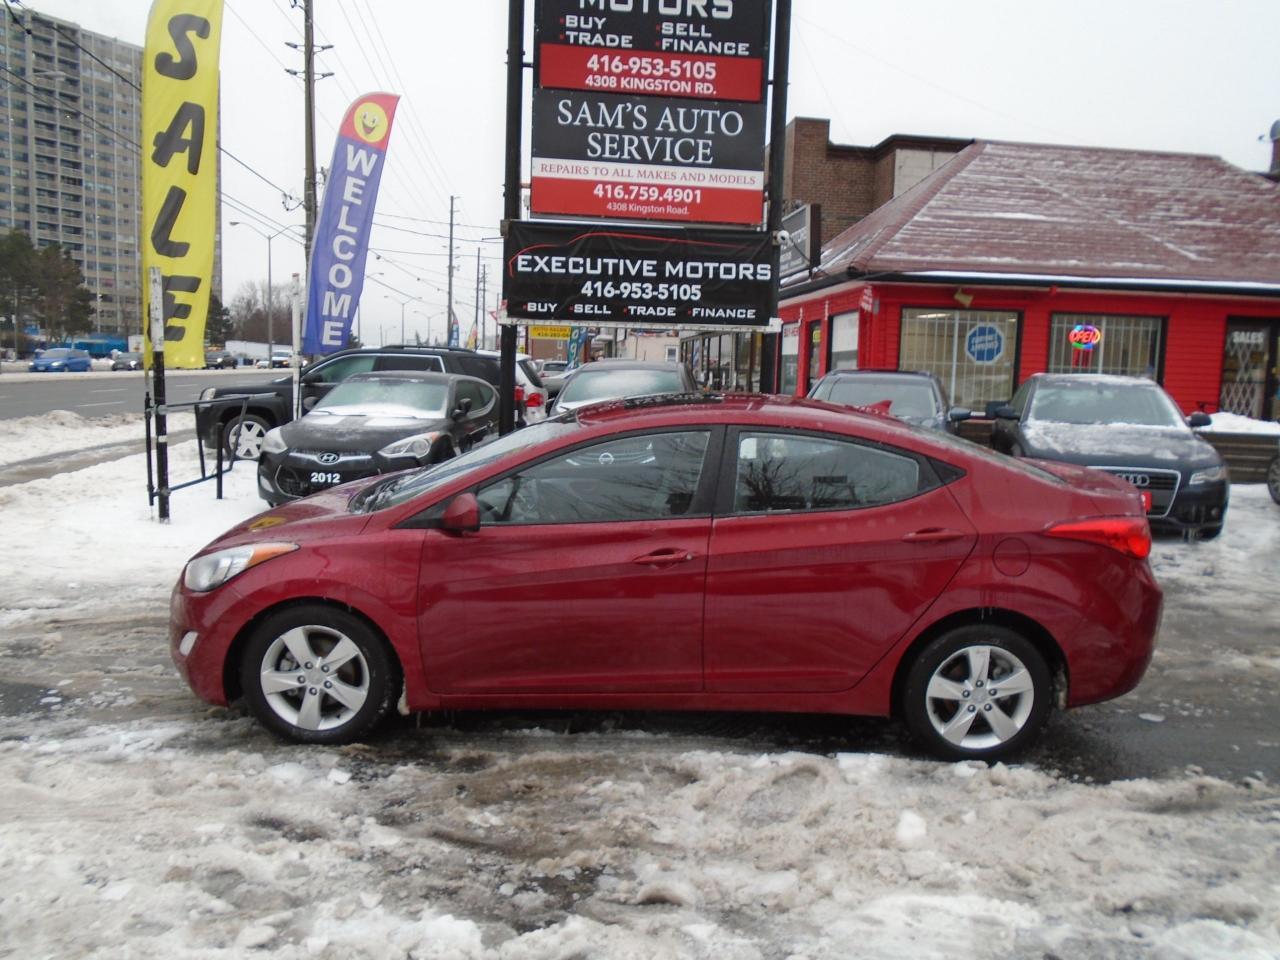 2013 Hyundai Elantra GLS/ LOADED /NEW BRAKES / NO ACCIDENT/ BLUETOOTH /